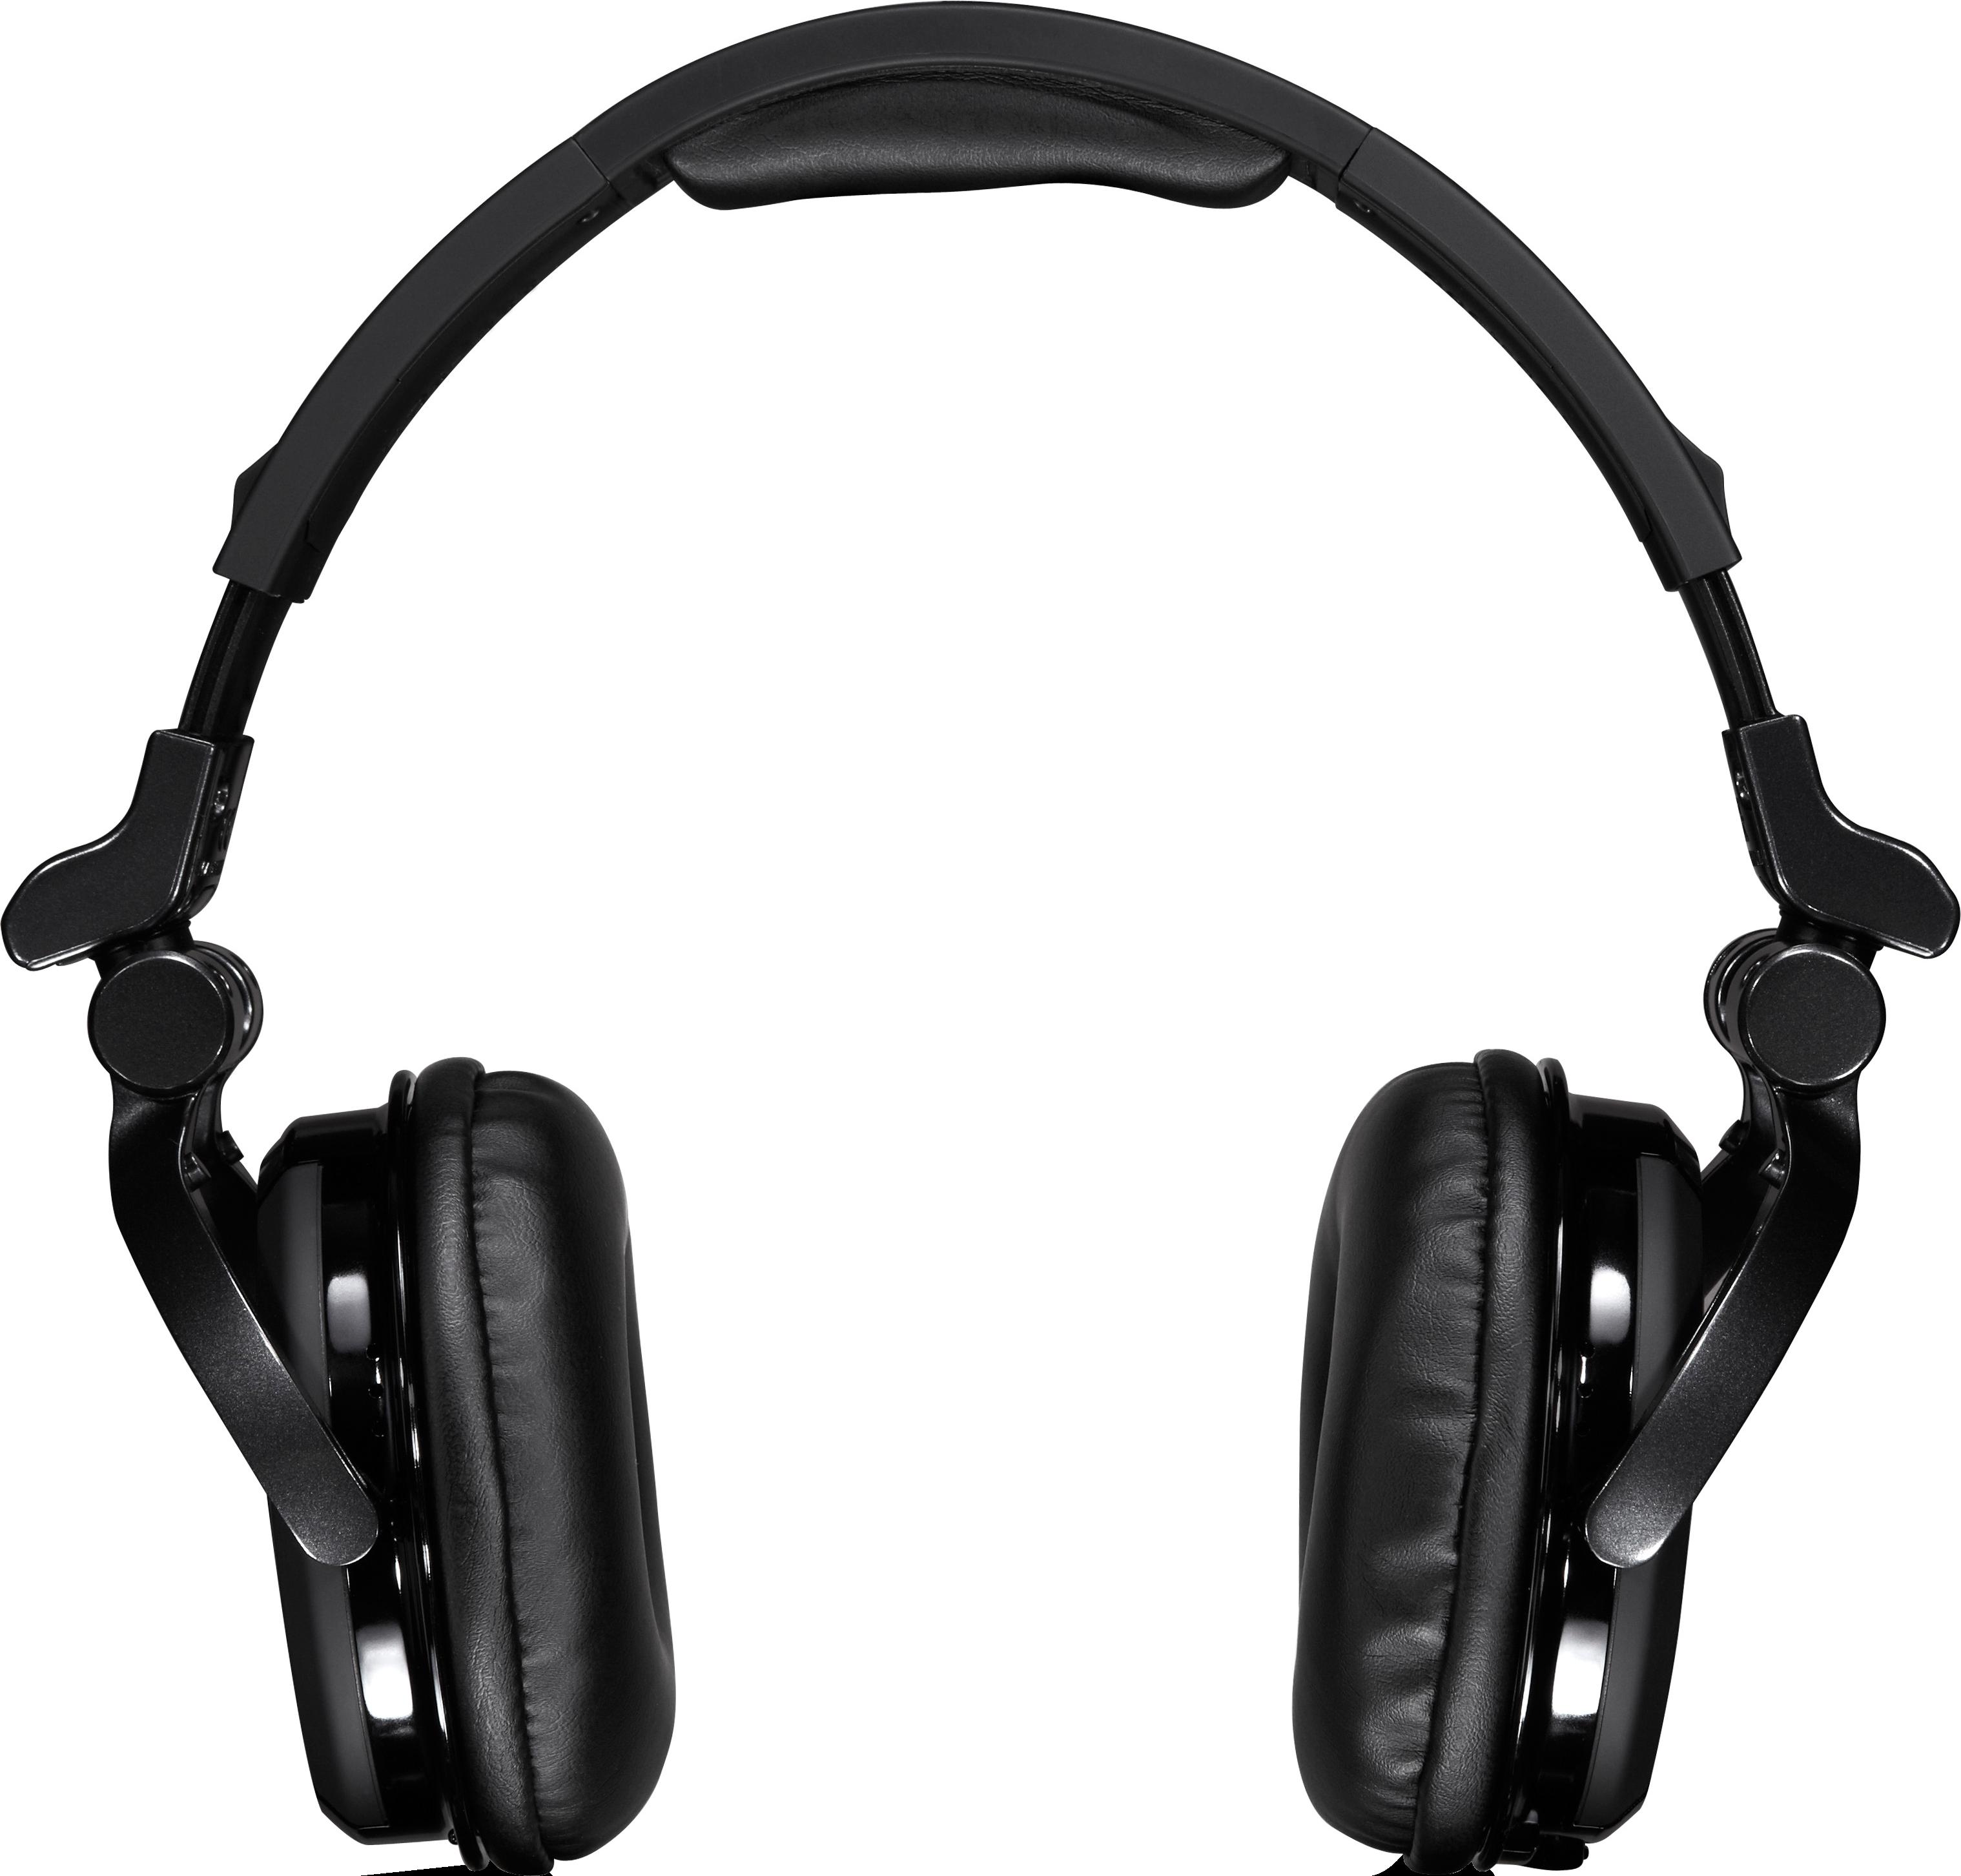 HDJ-1500 front